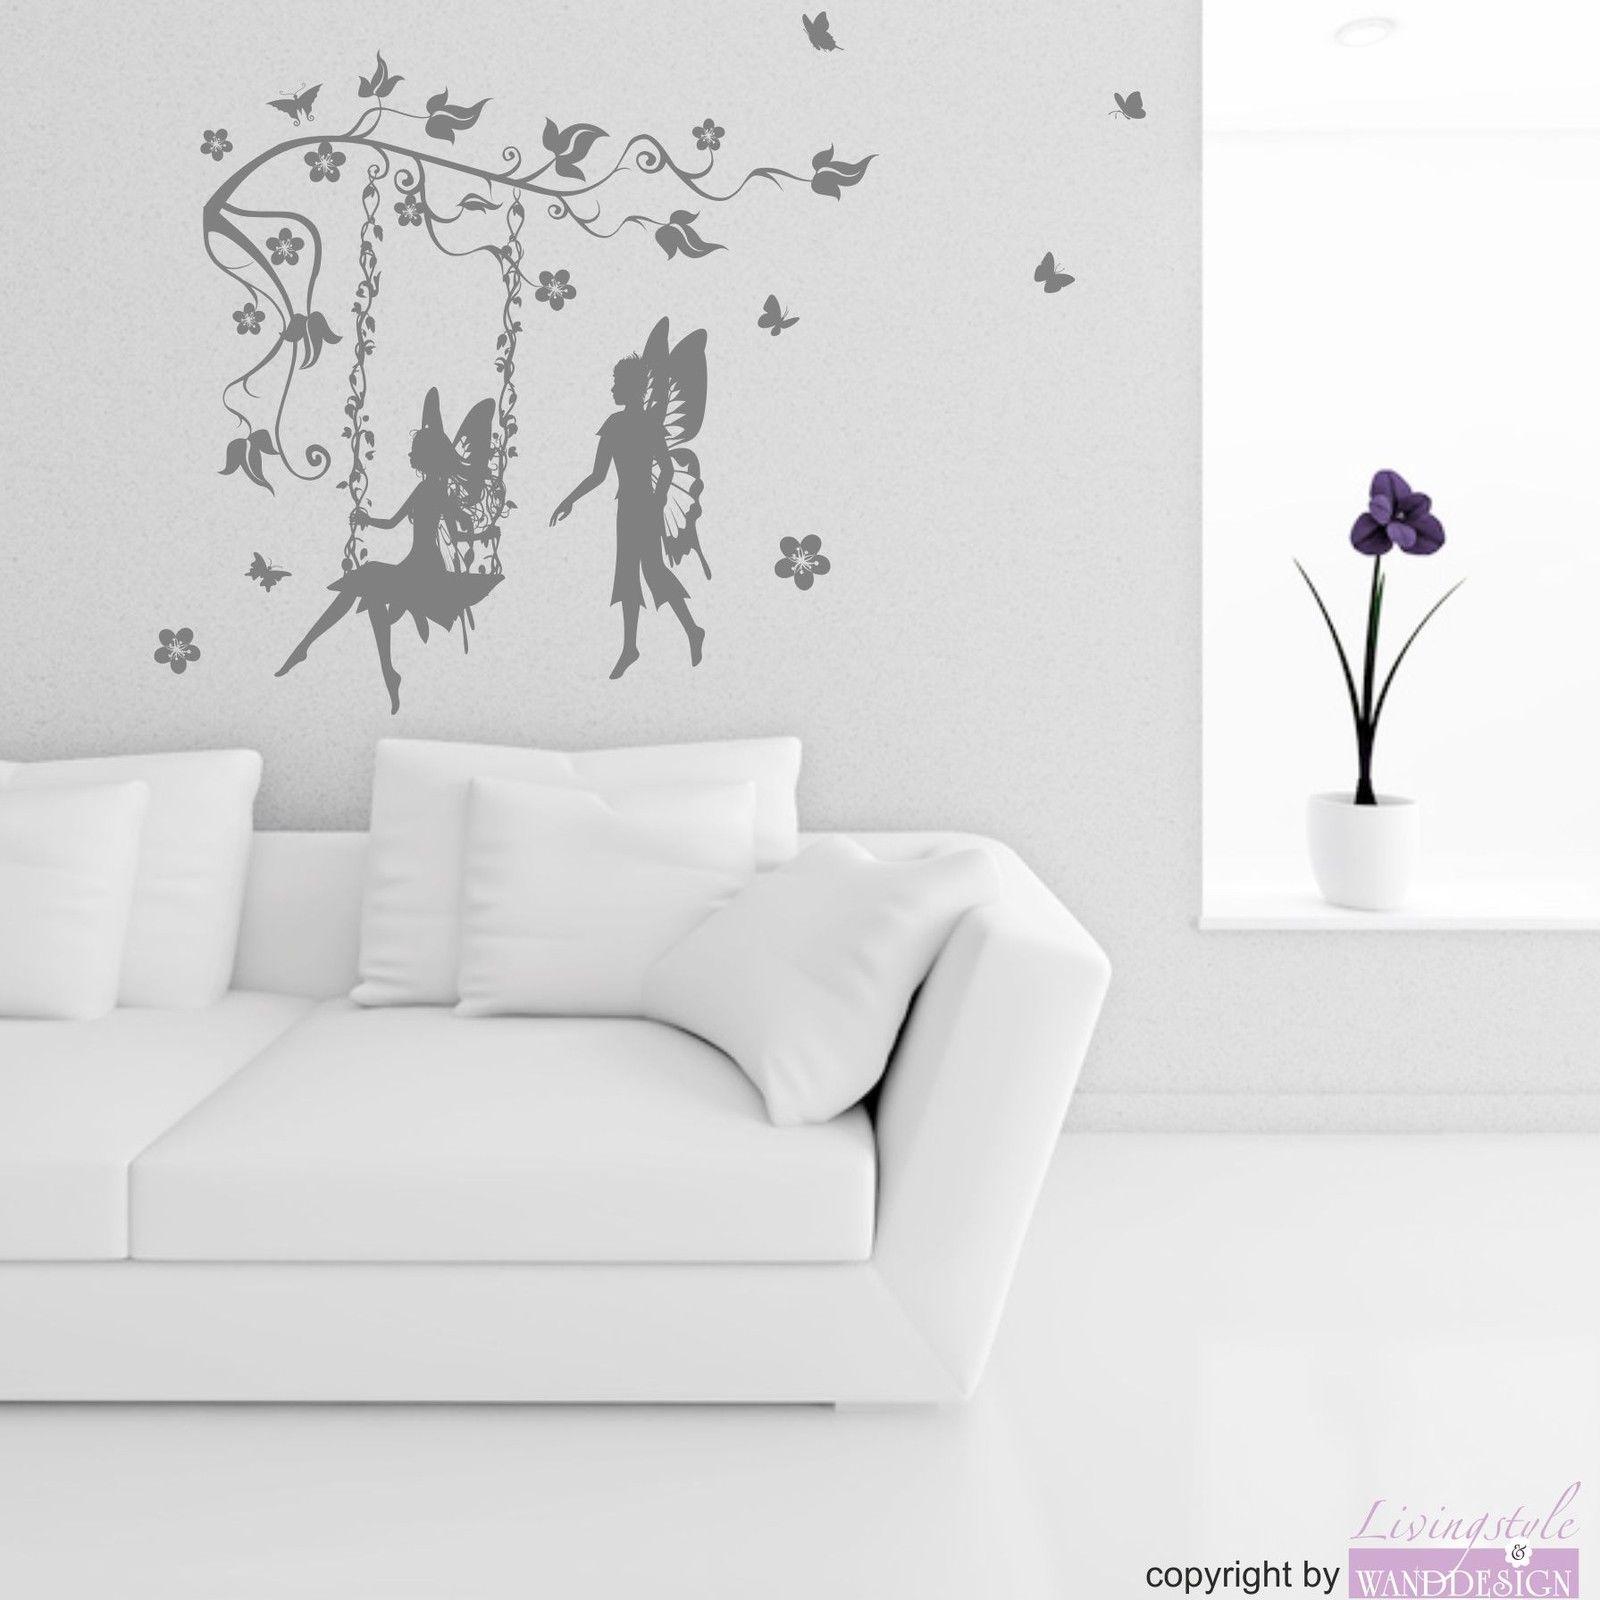 wanddesign bedroom set concrete walls panorama window. Black Bedroom Furniture Sets. Home Design Ideas